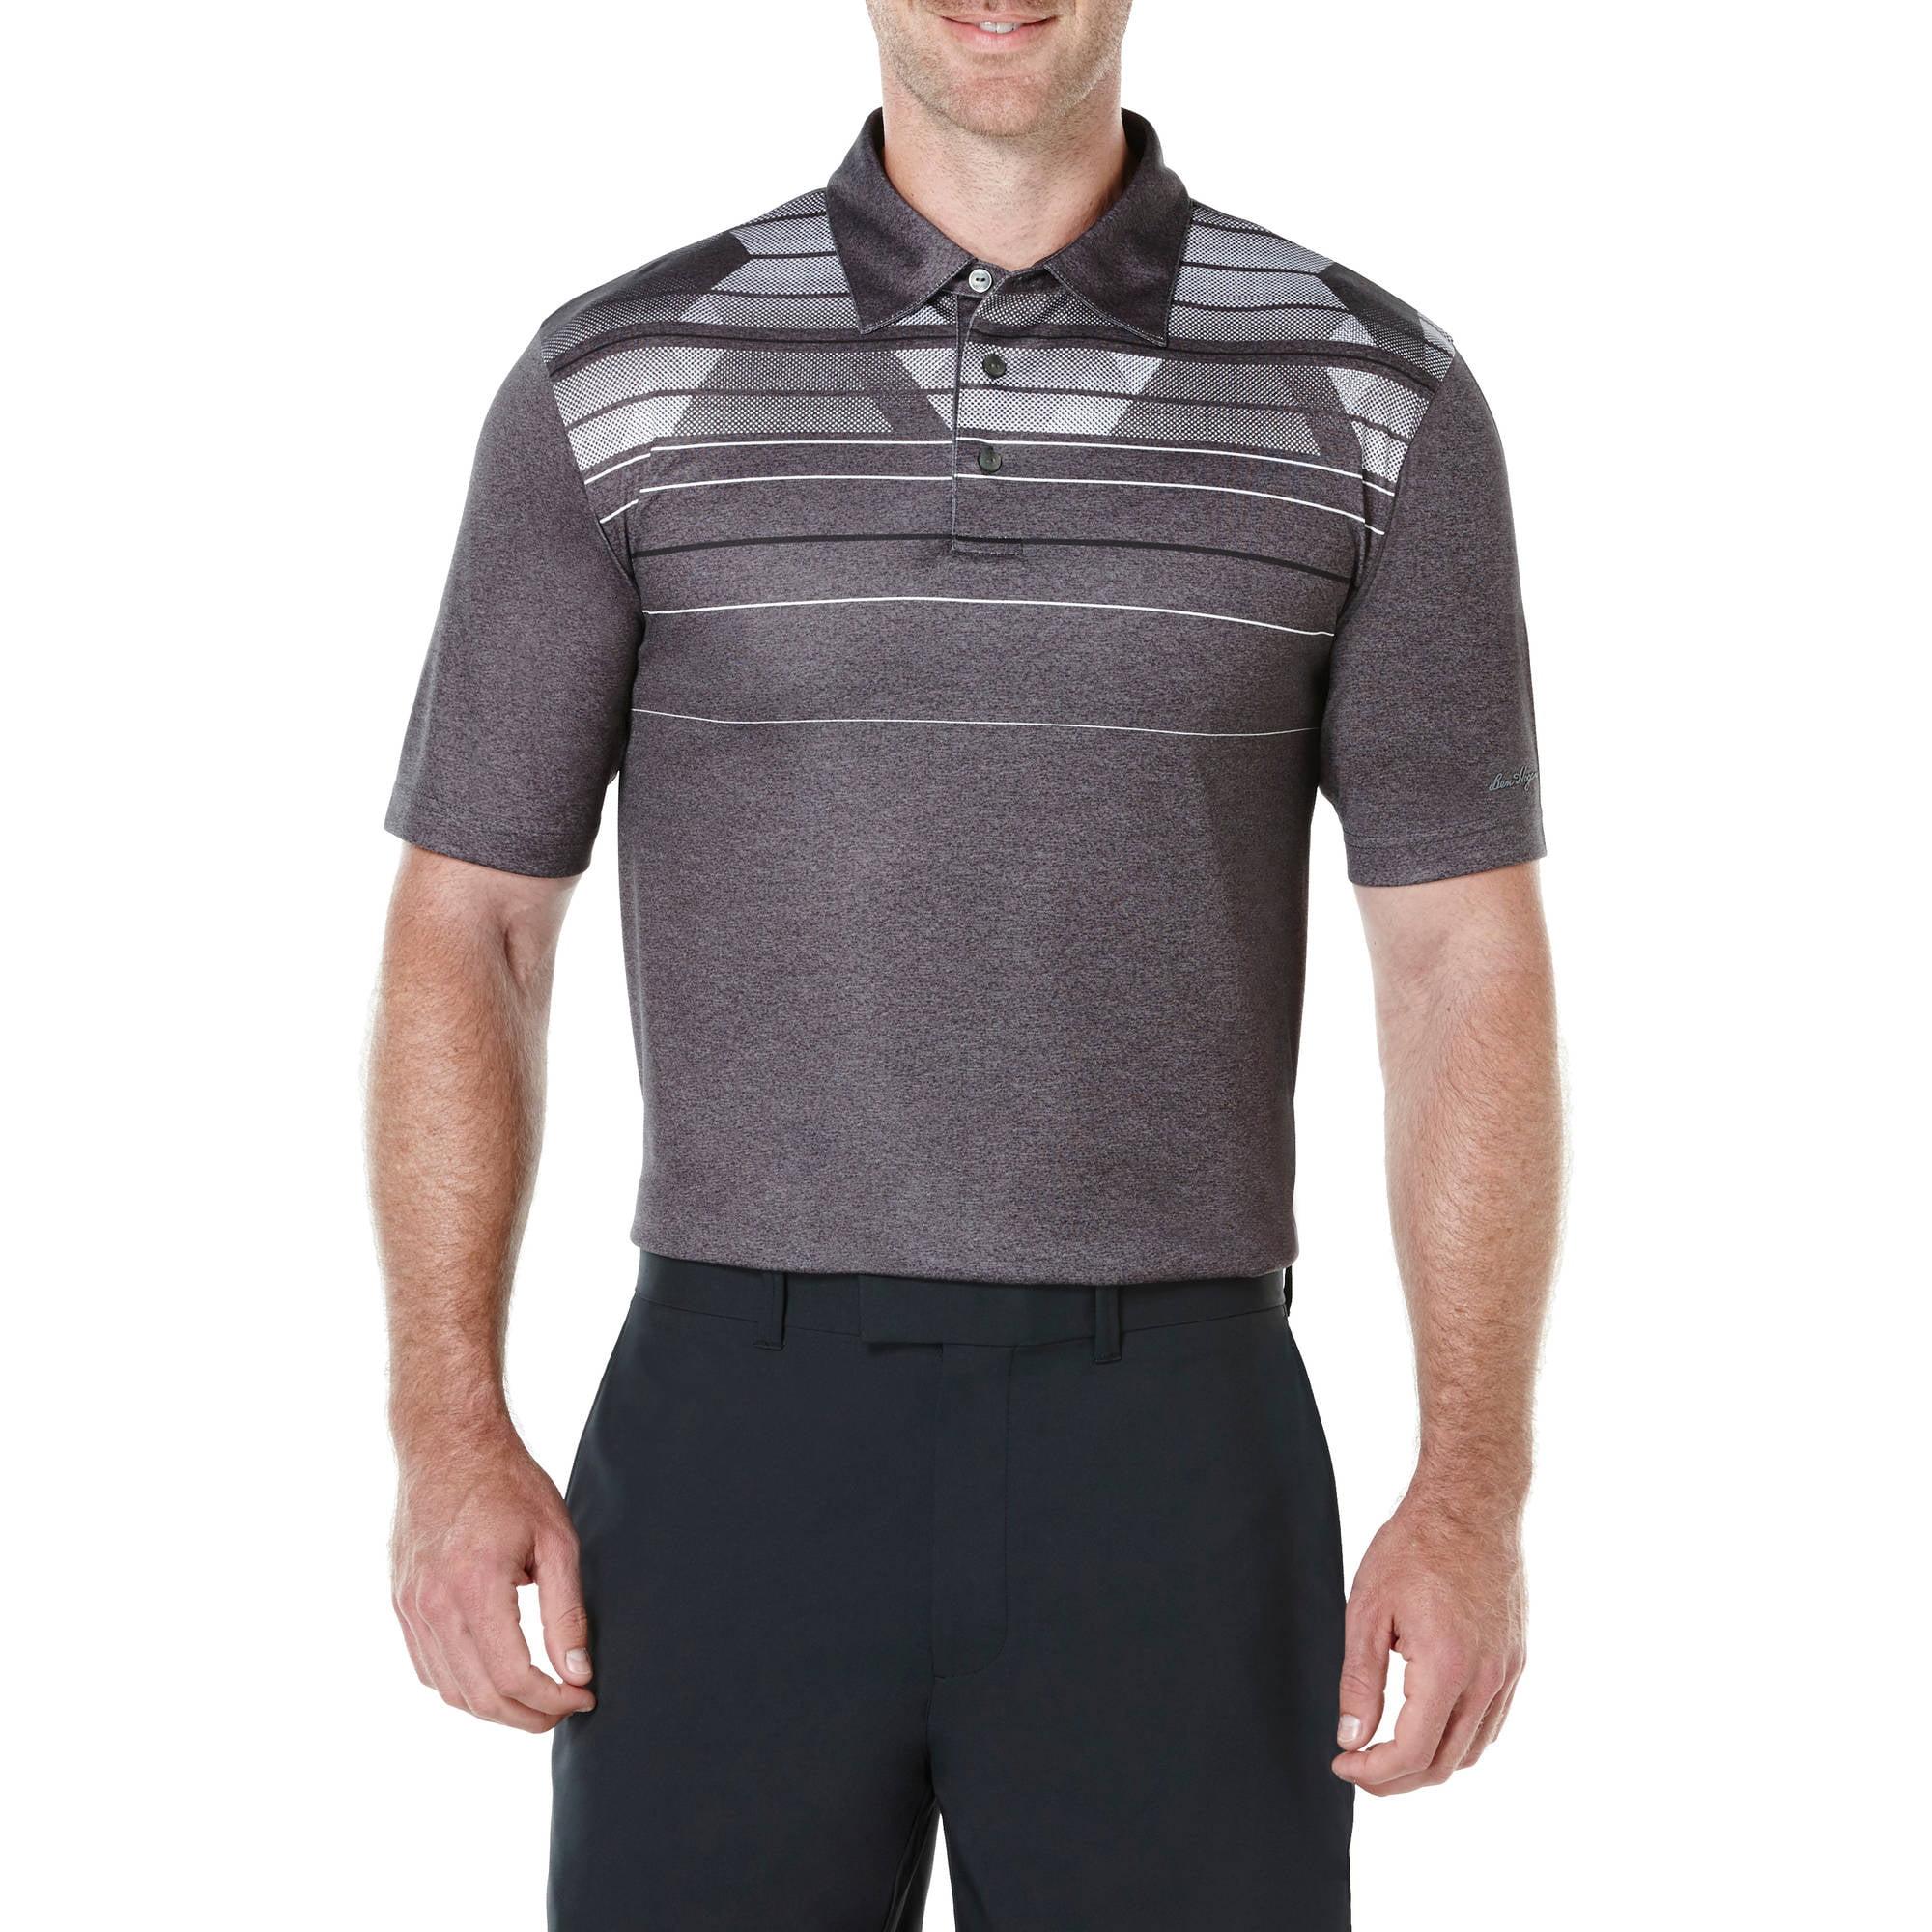 Ben Hogan Performance Big Men's Heather Shoulder Print  Polo Shirt